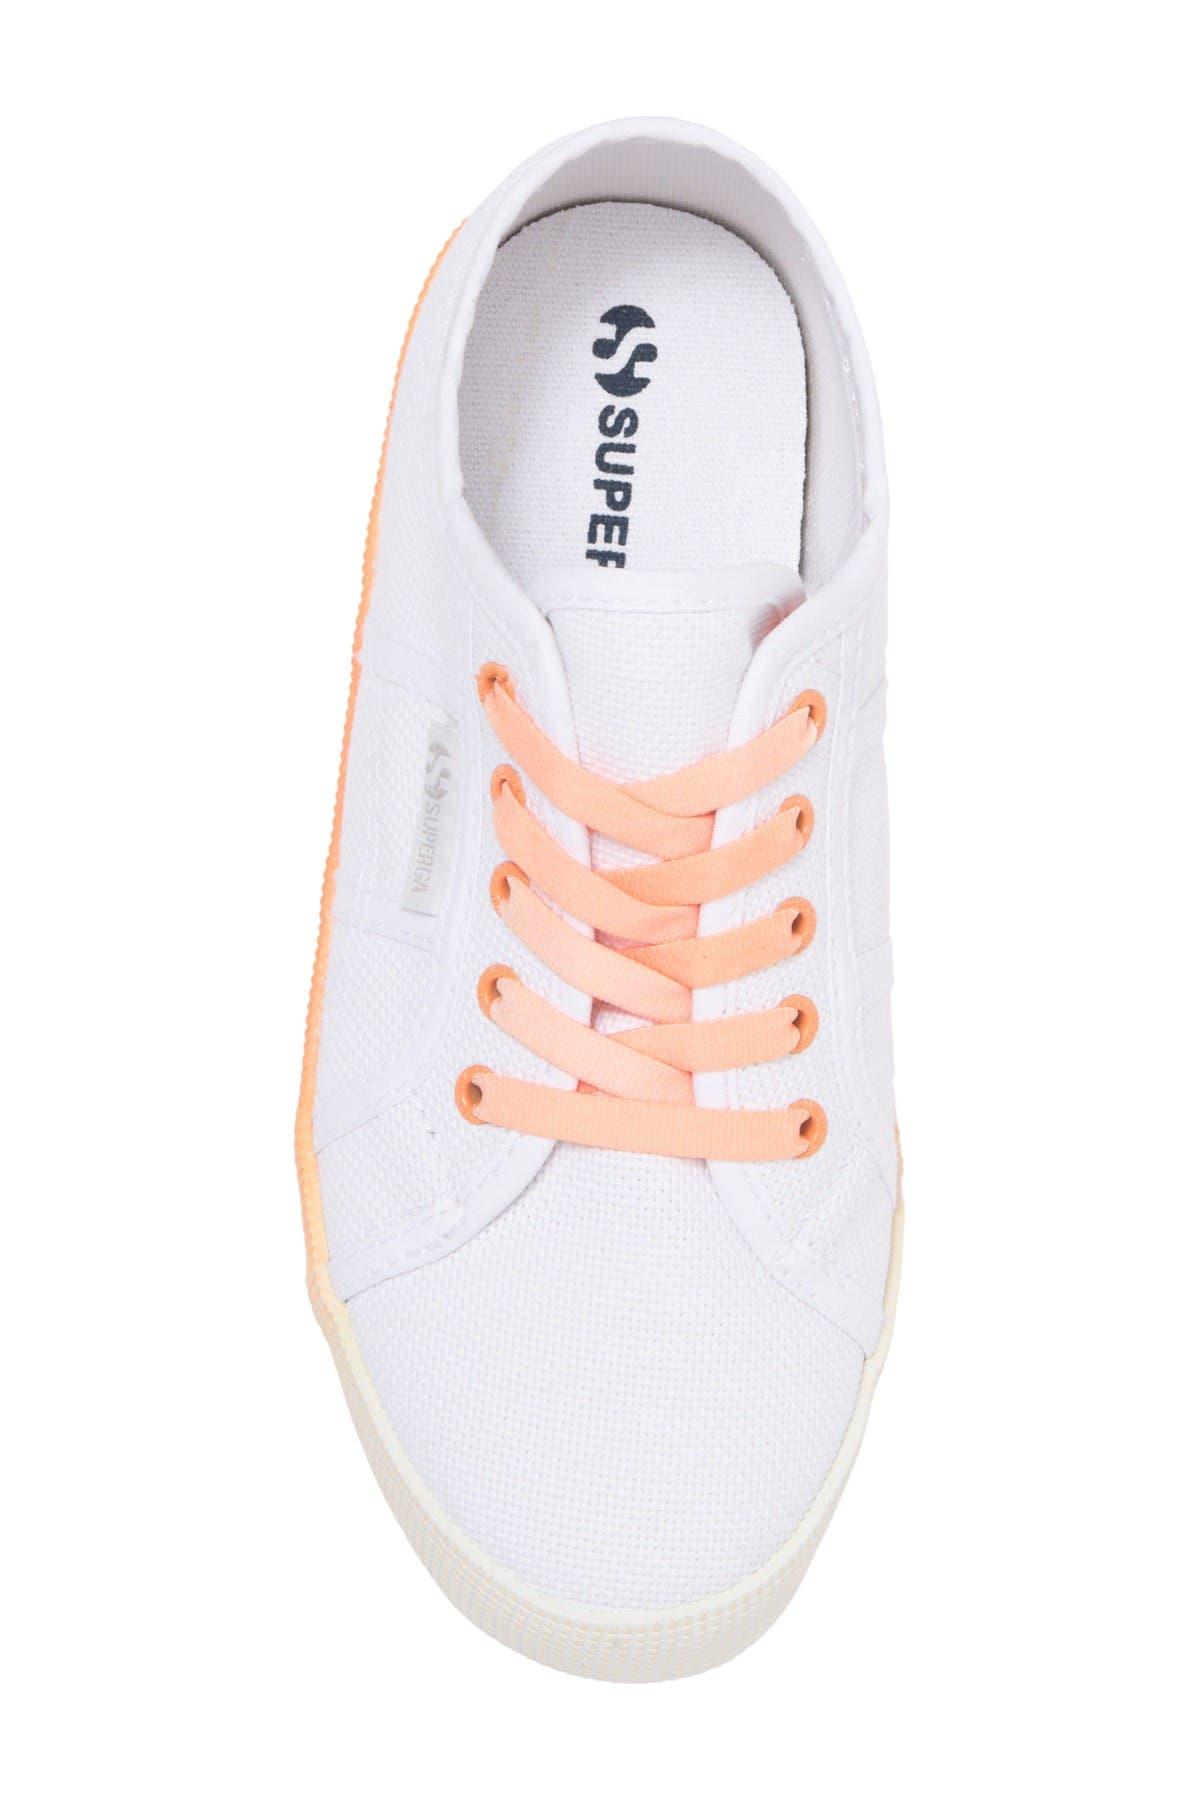 Superga Gradient Lace-Up Sneaker